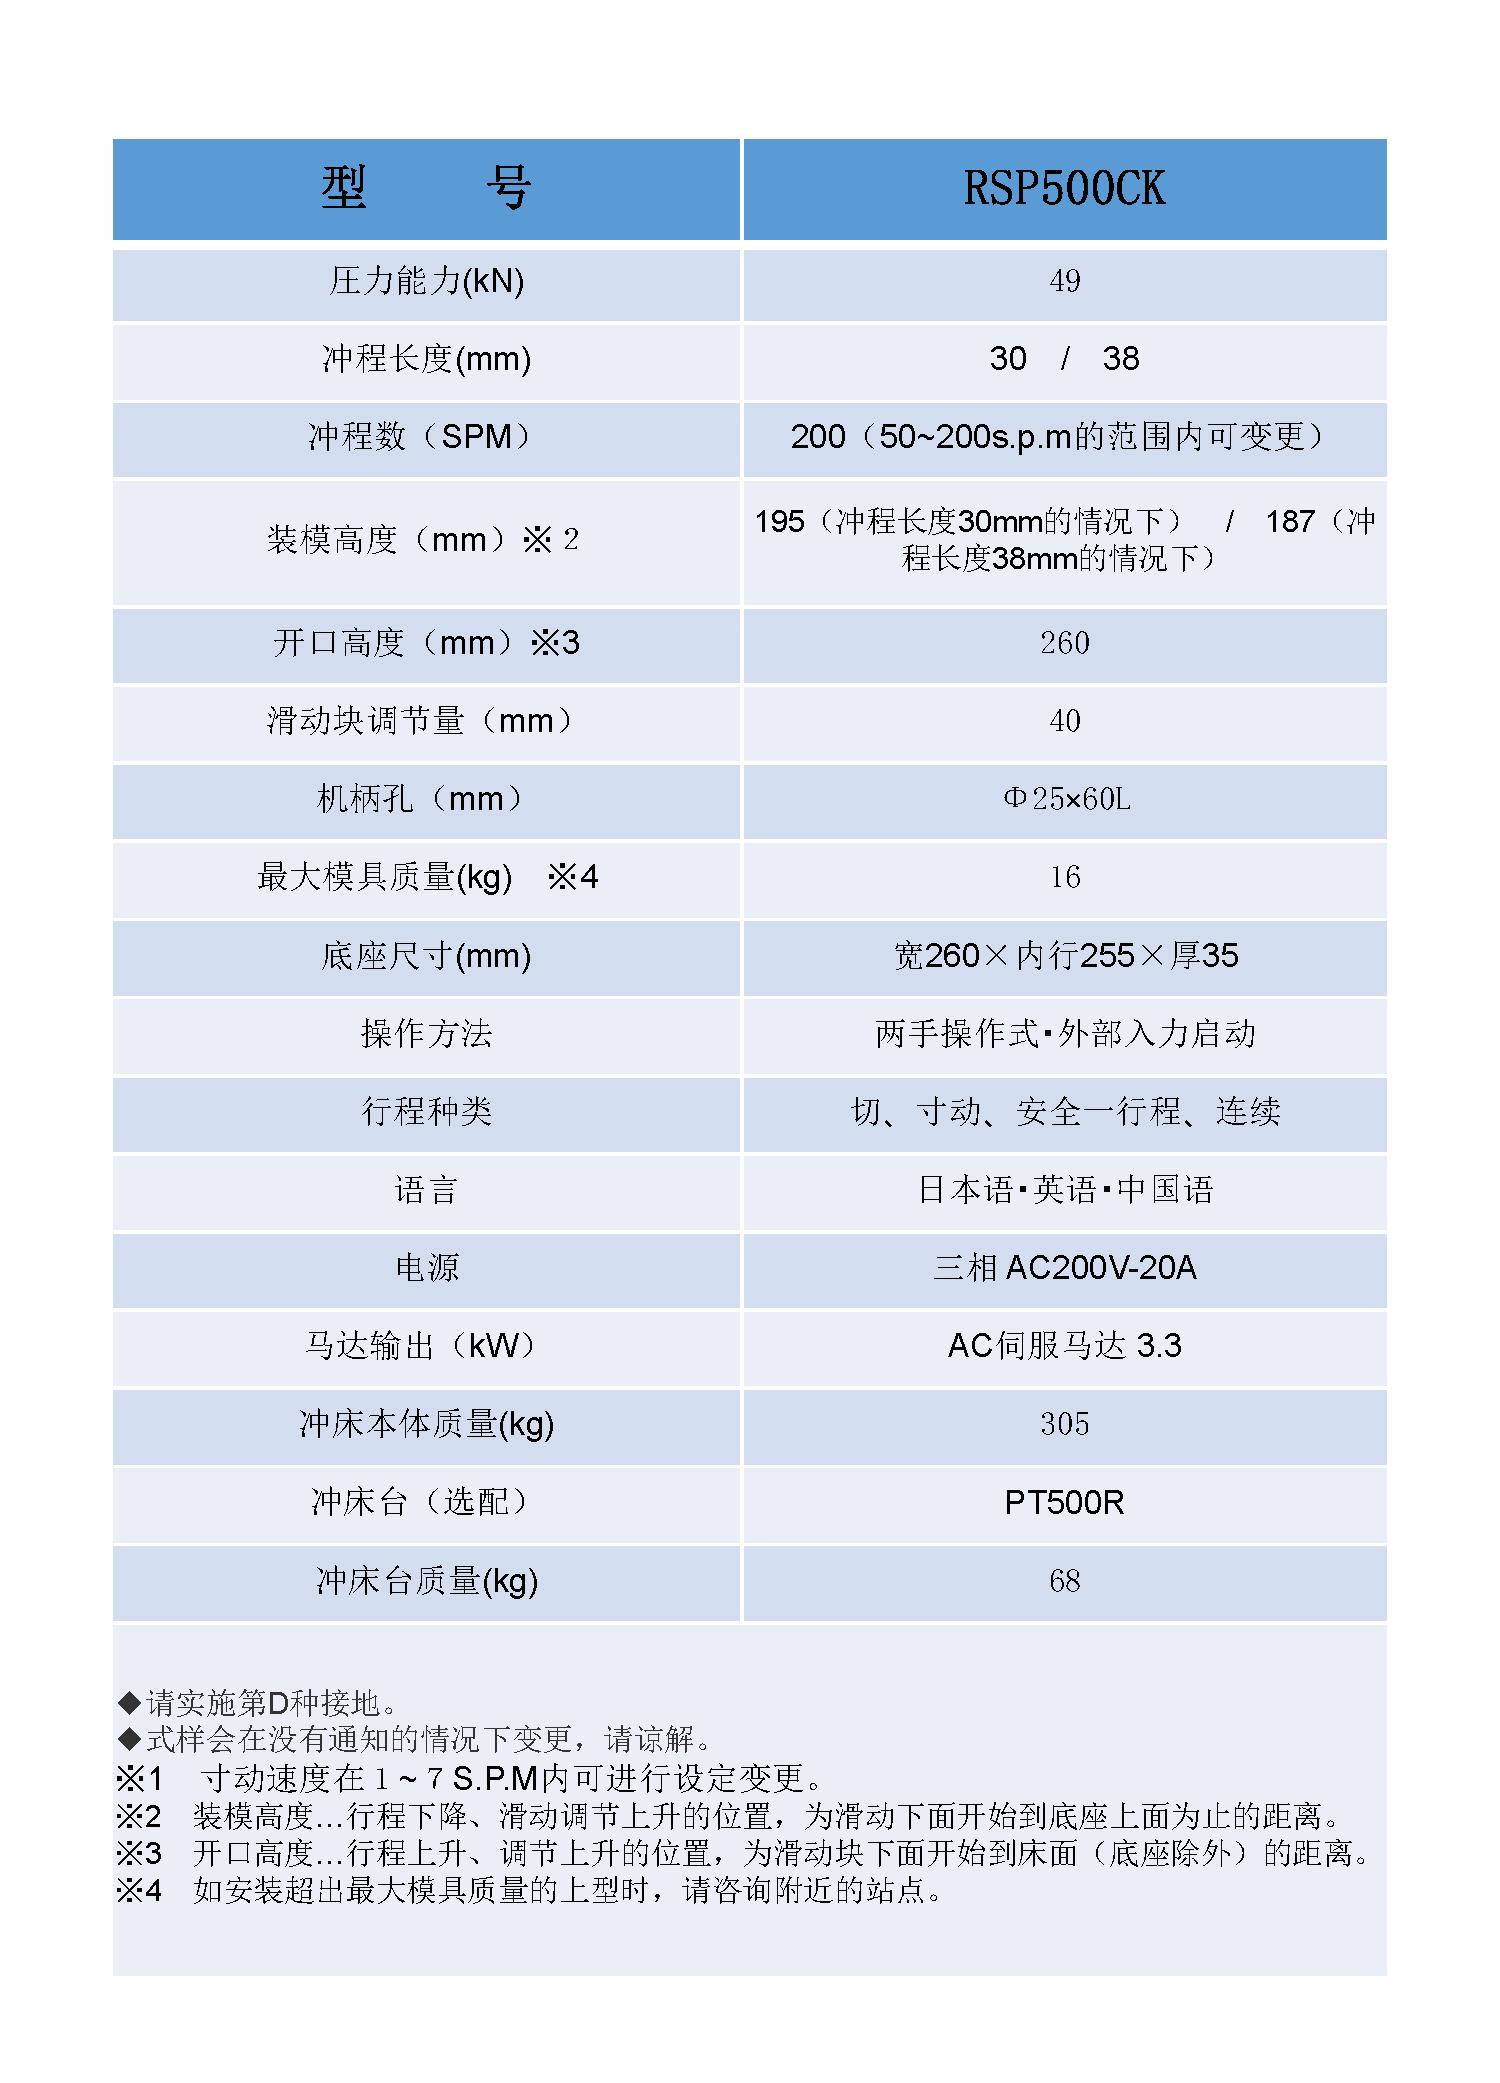 RSP500CK_仕様書 - 中文.png